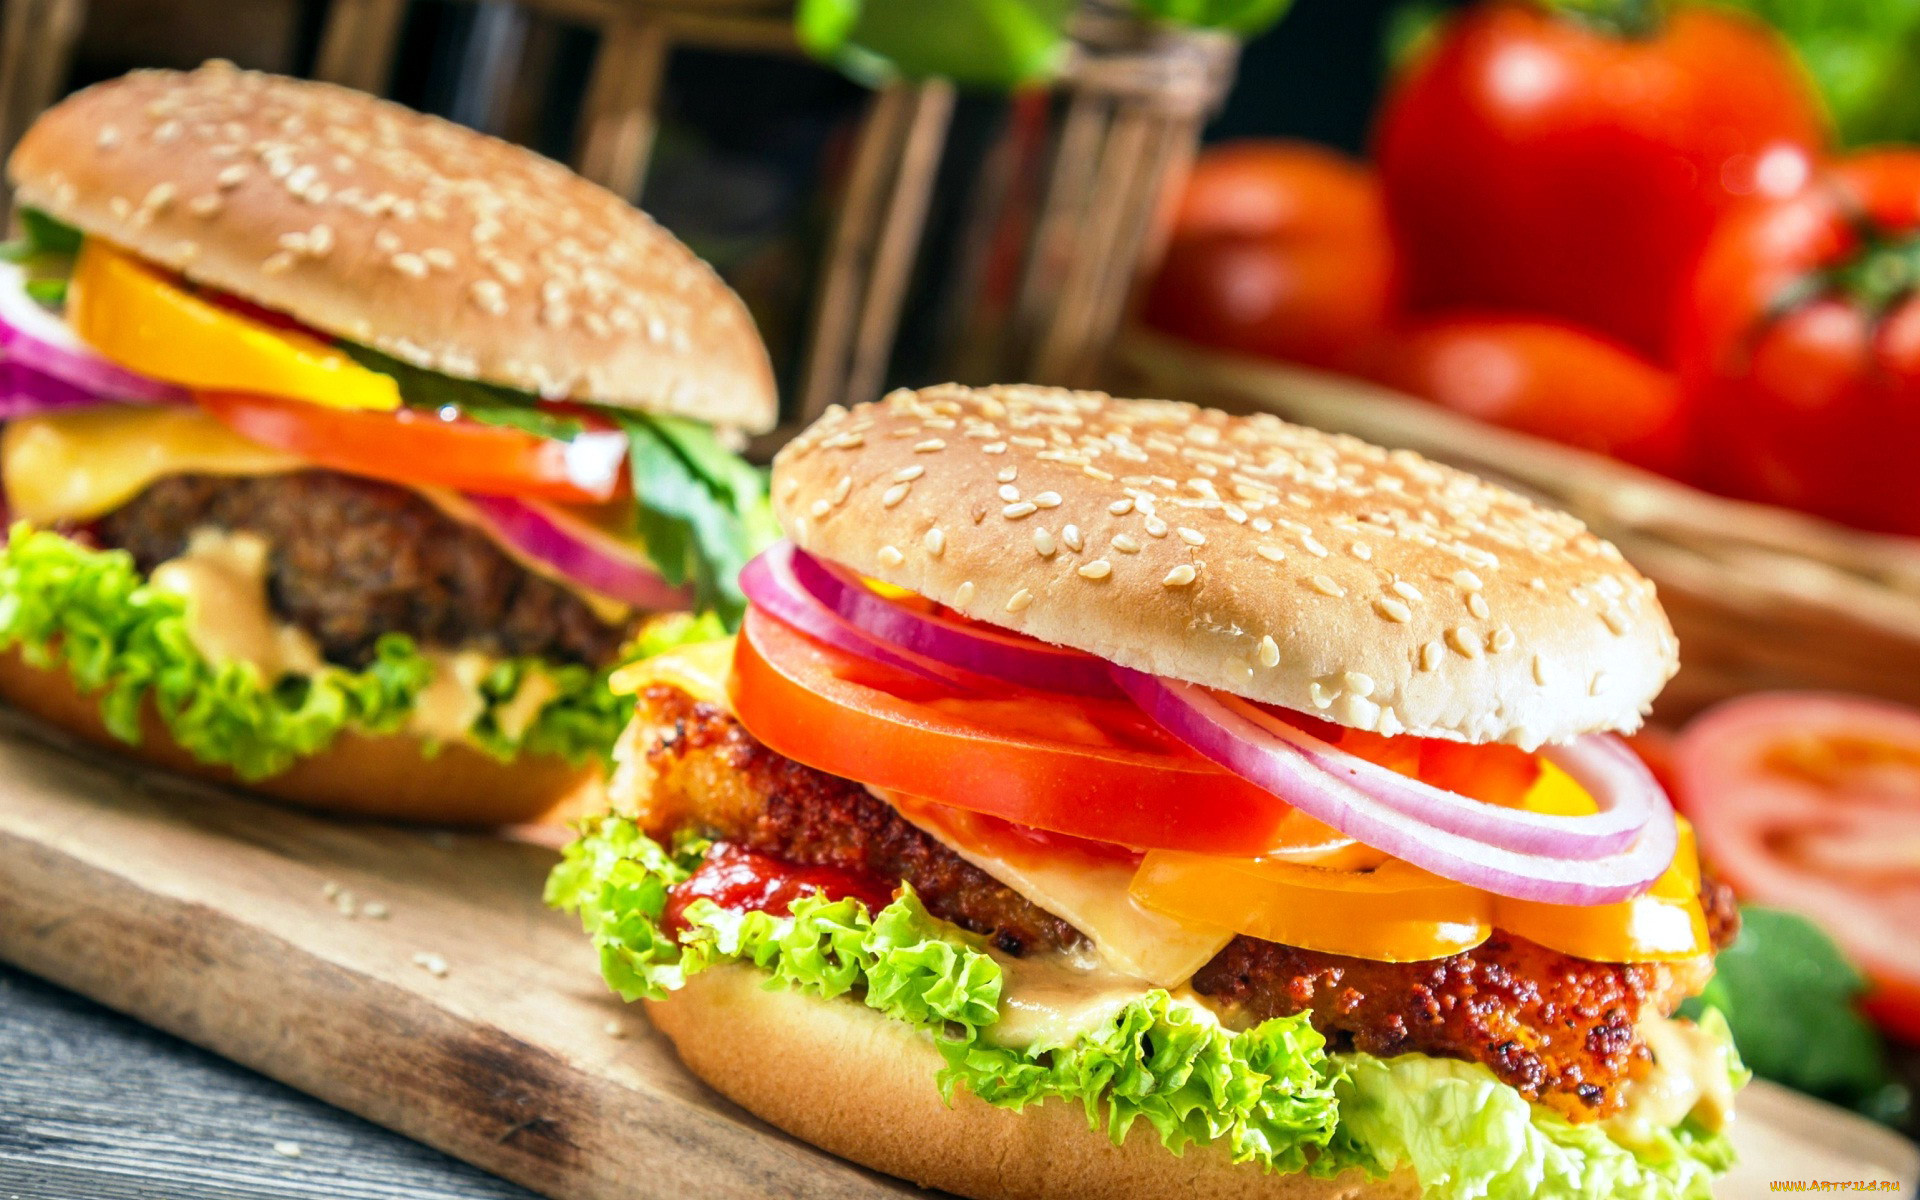 позабыли, картинка про гамбургер знала